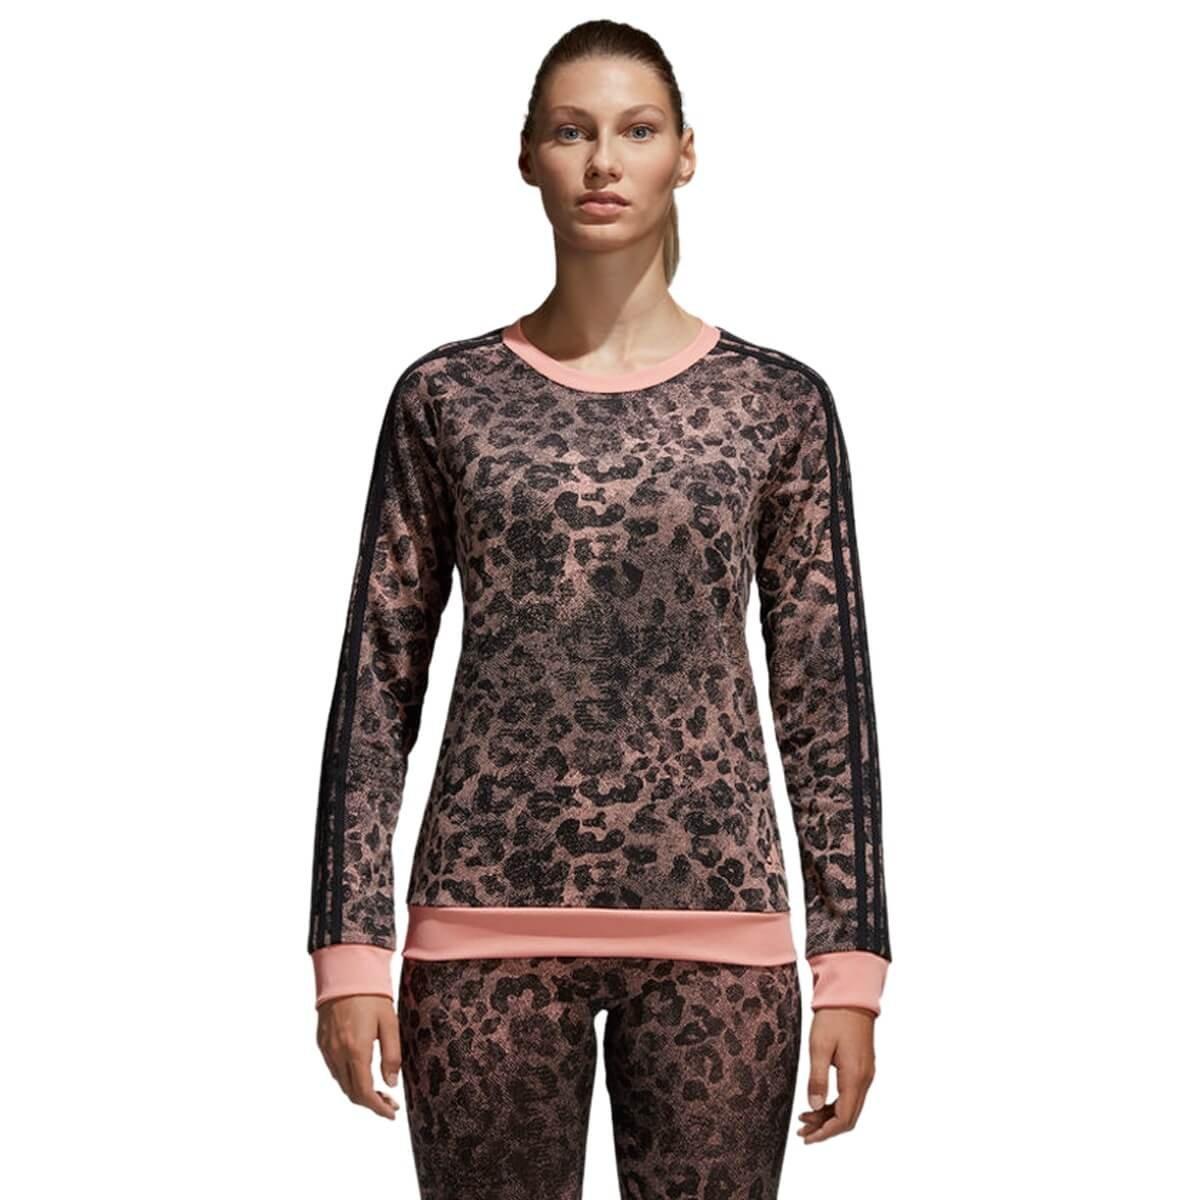 d0703a19410 Bizz Store - Blusa Moletom Feminina Adidas Essentials